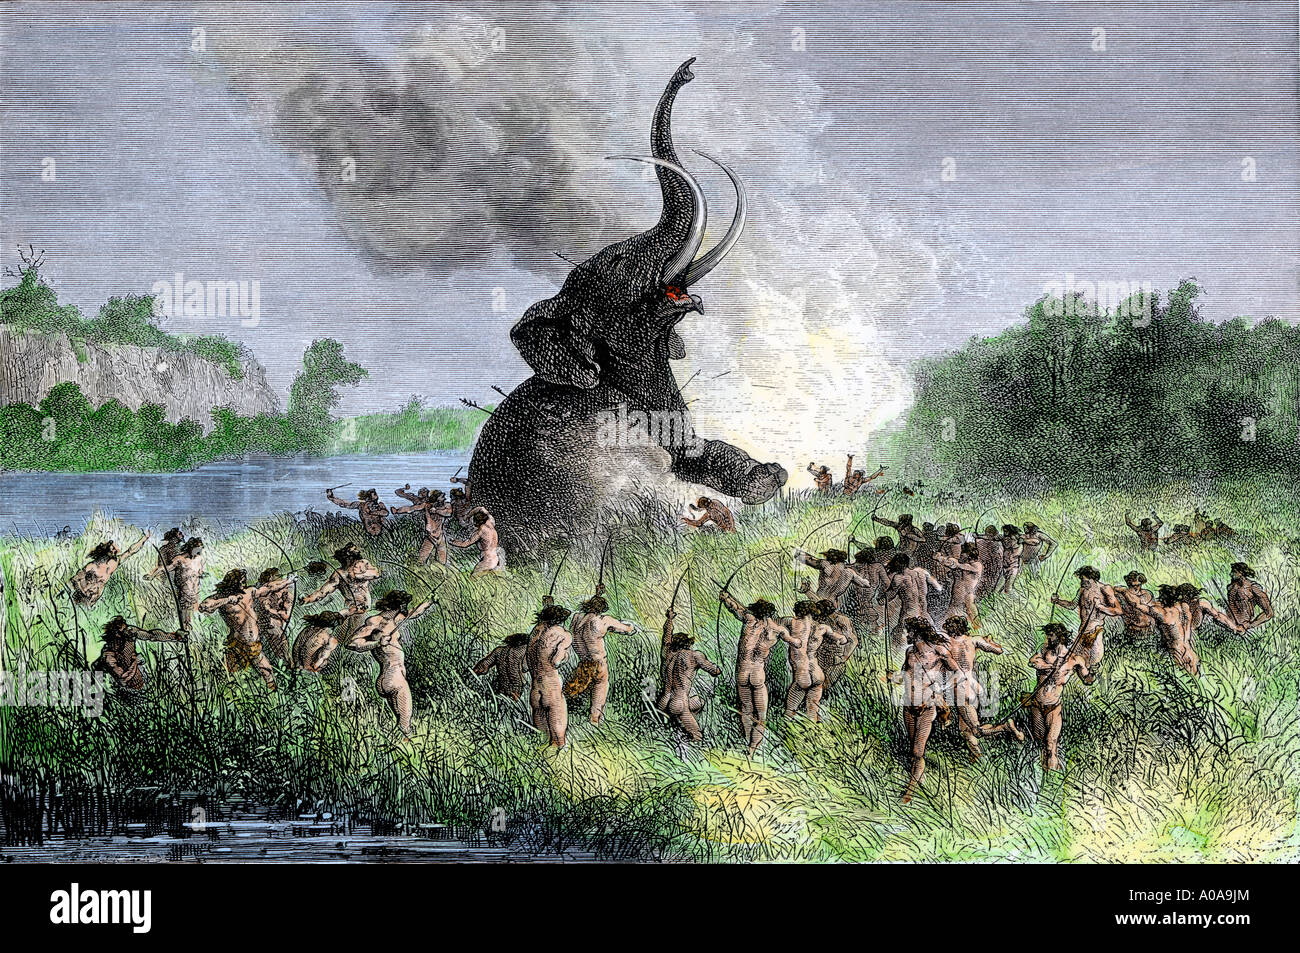 Wooly mammoth cazadores prehistóricos usando arcos y flechas Imagen De Stock